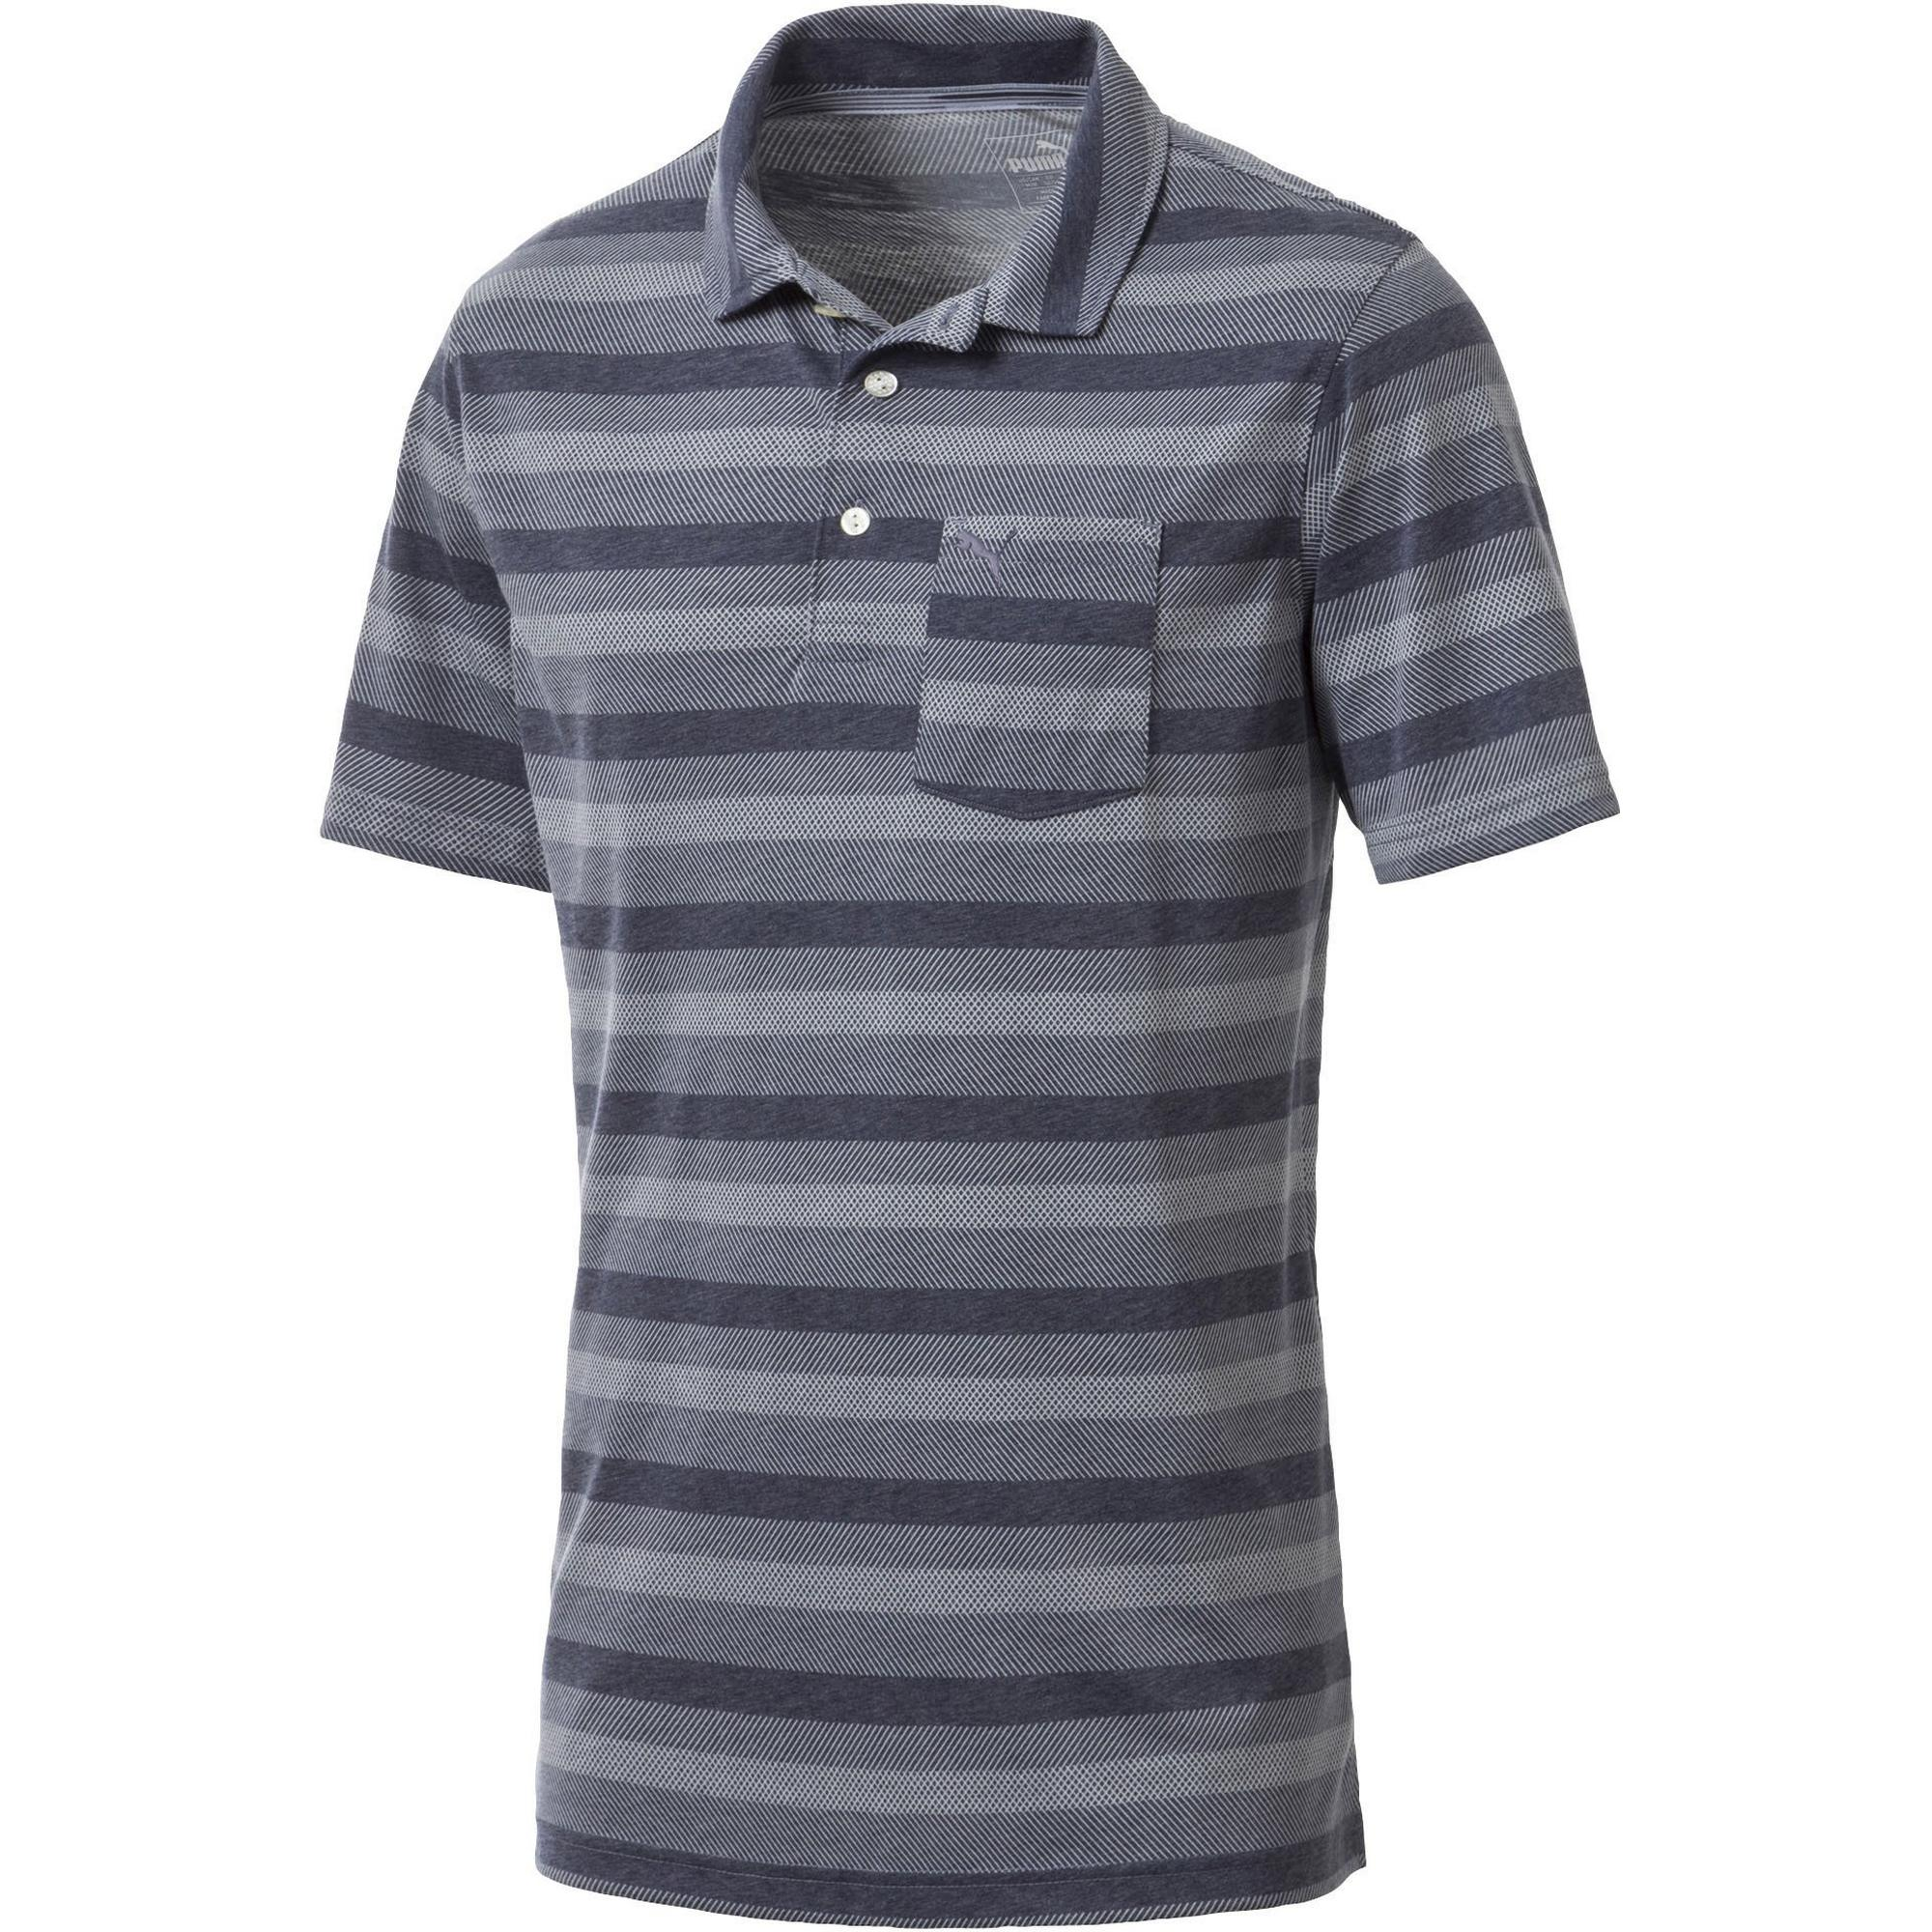 Men's Local Pro Throwback Short Sleeve Polo